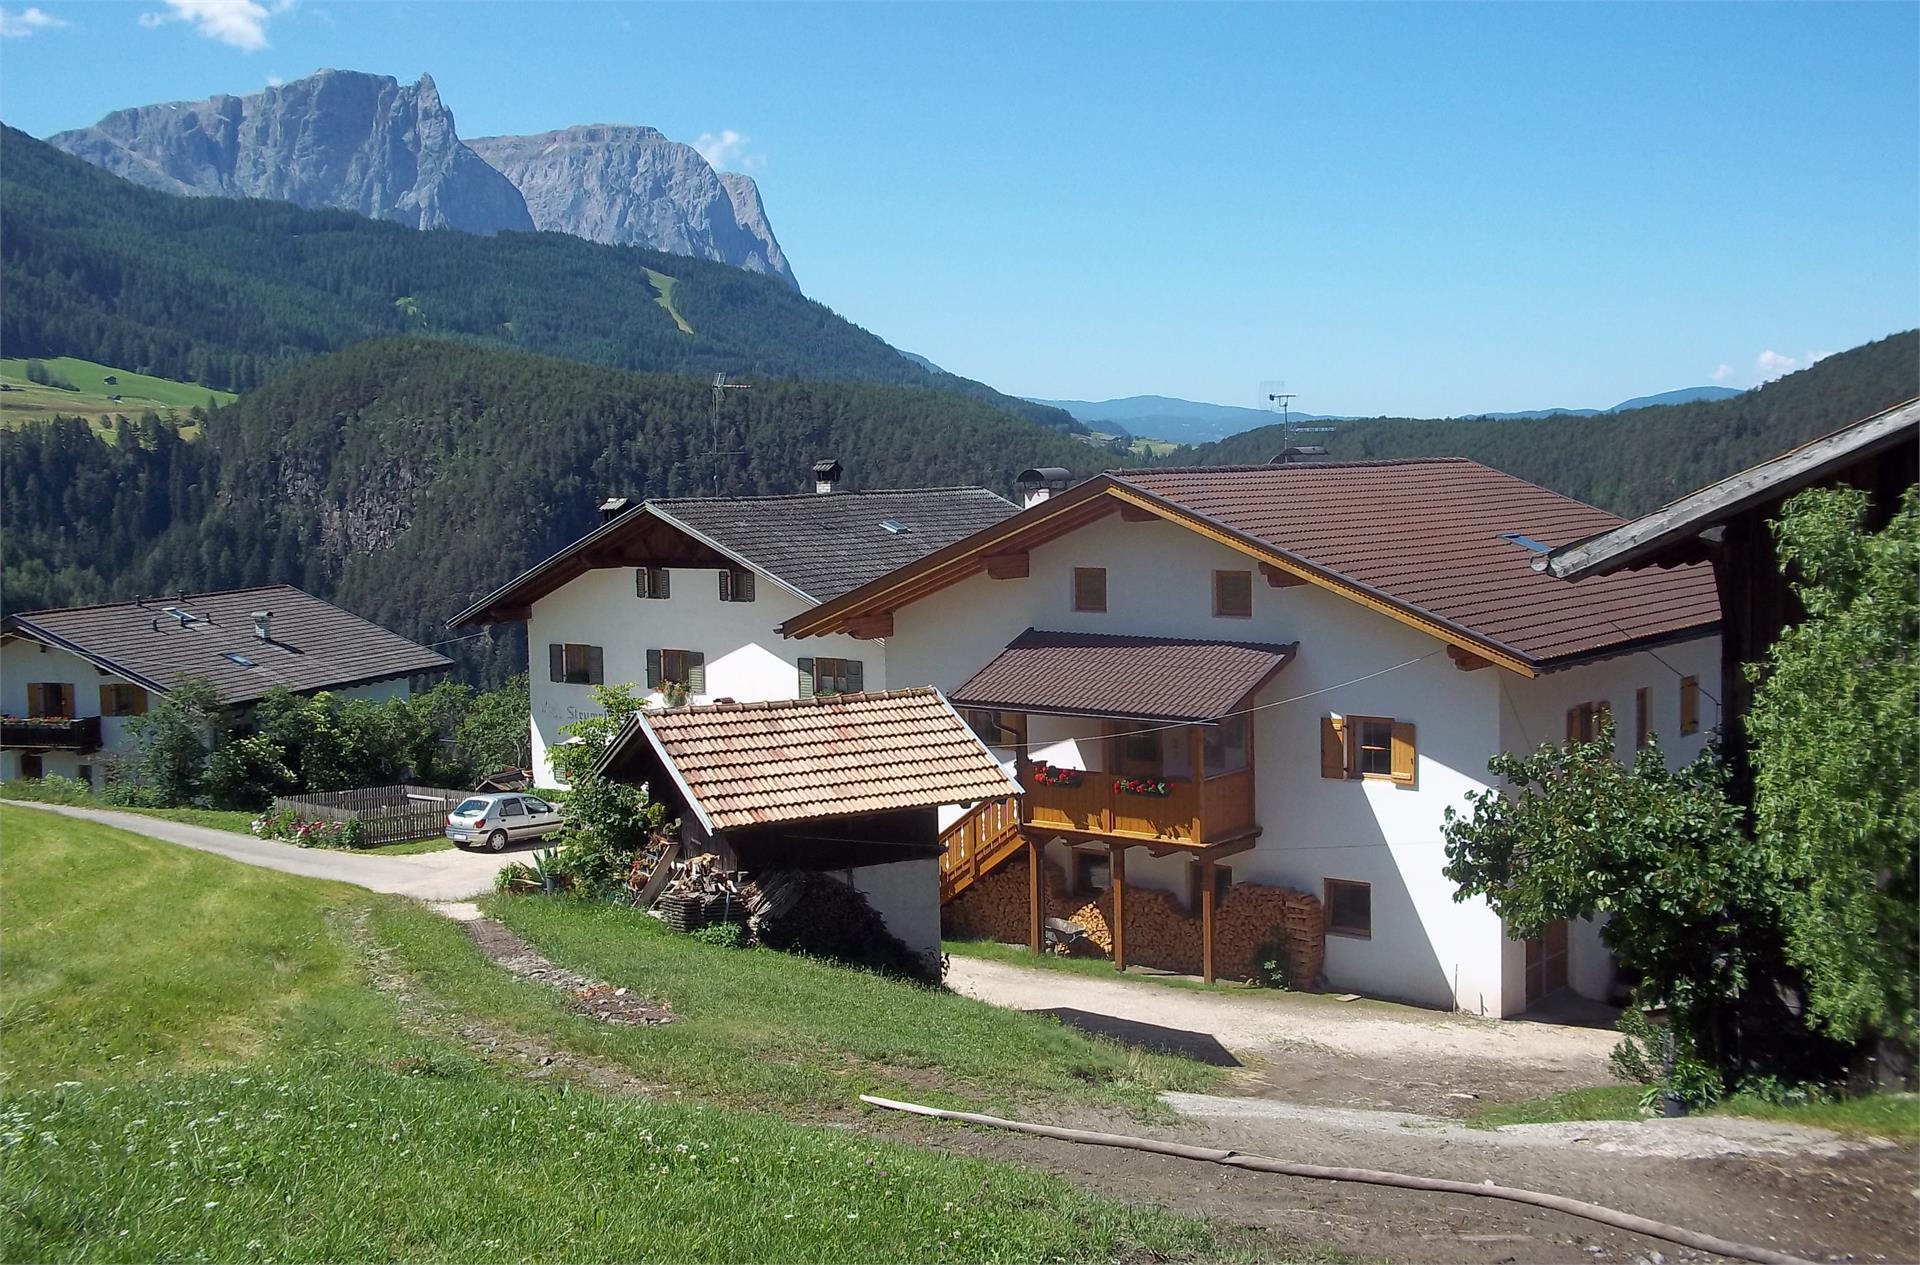 Strumpflunerhof